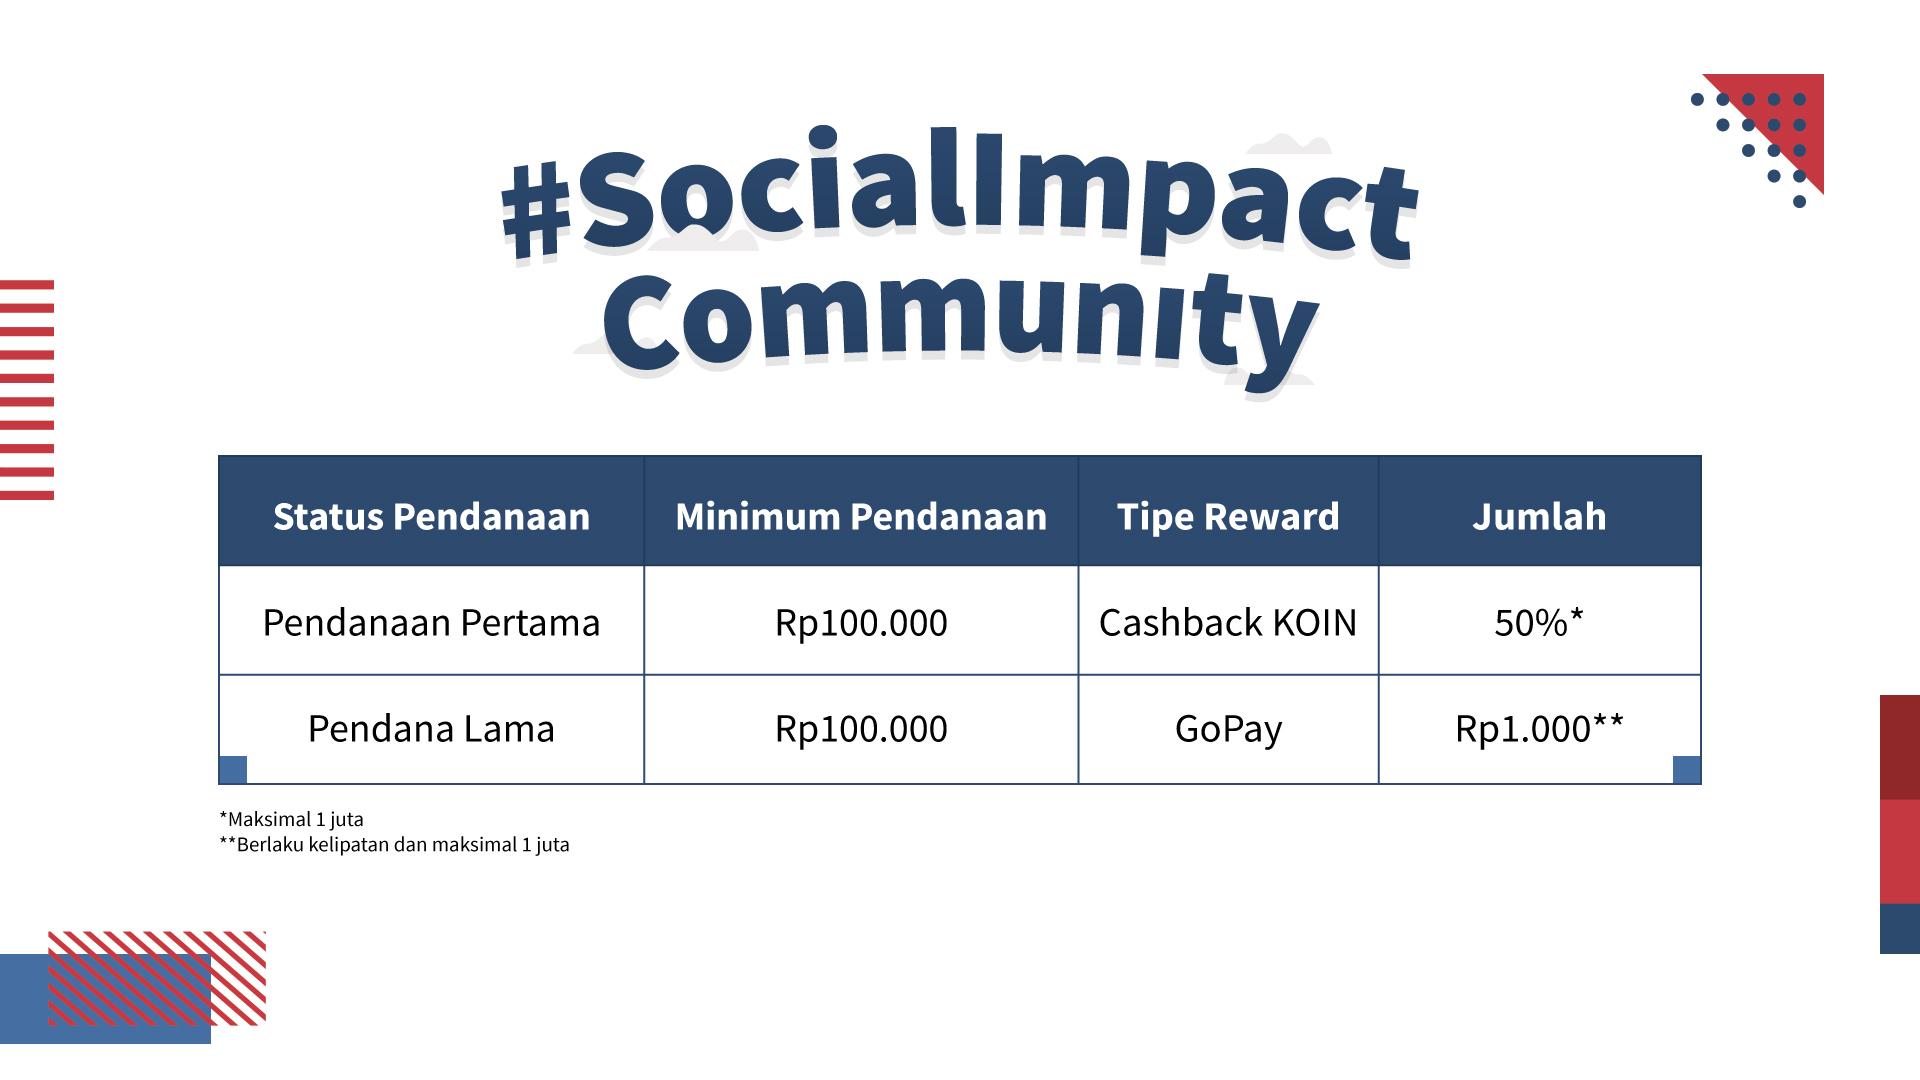 Promo-Social-Impact-Community-Tabel